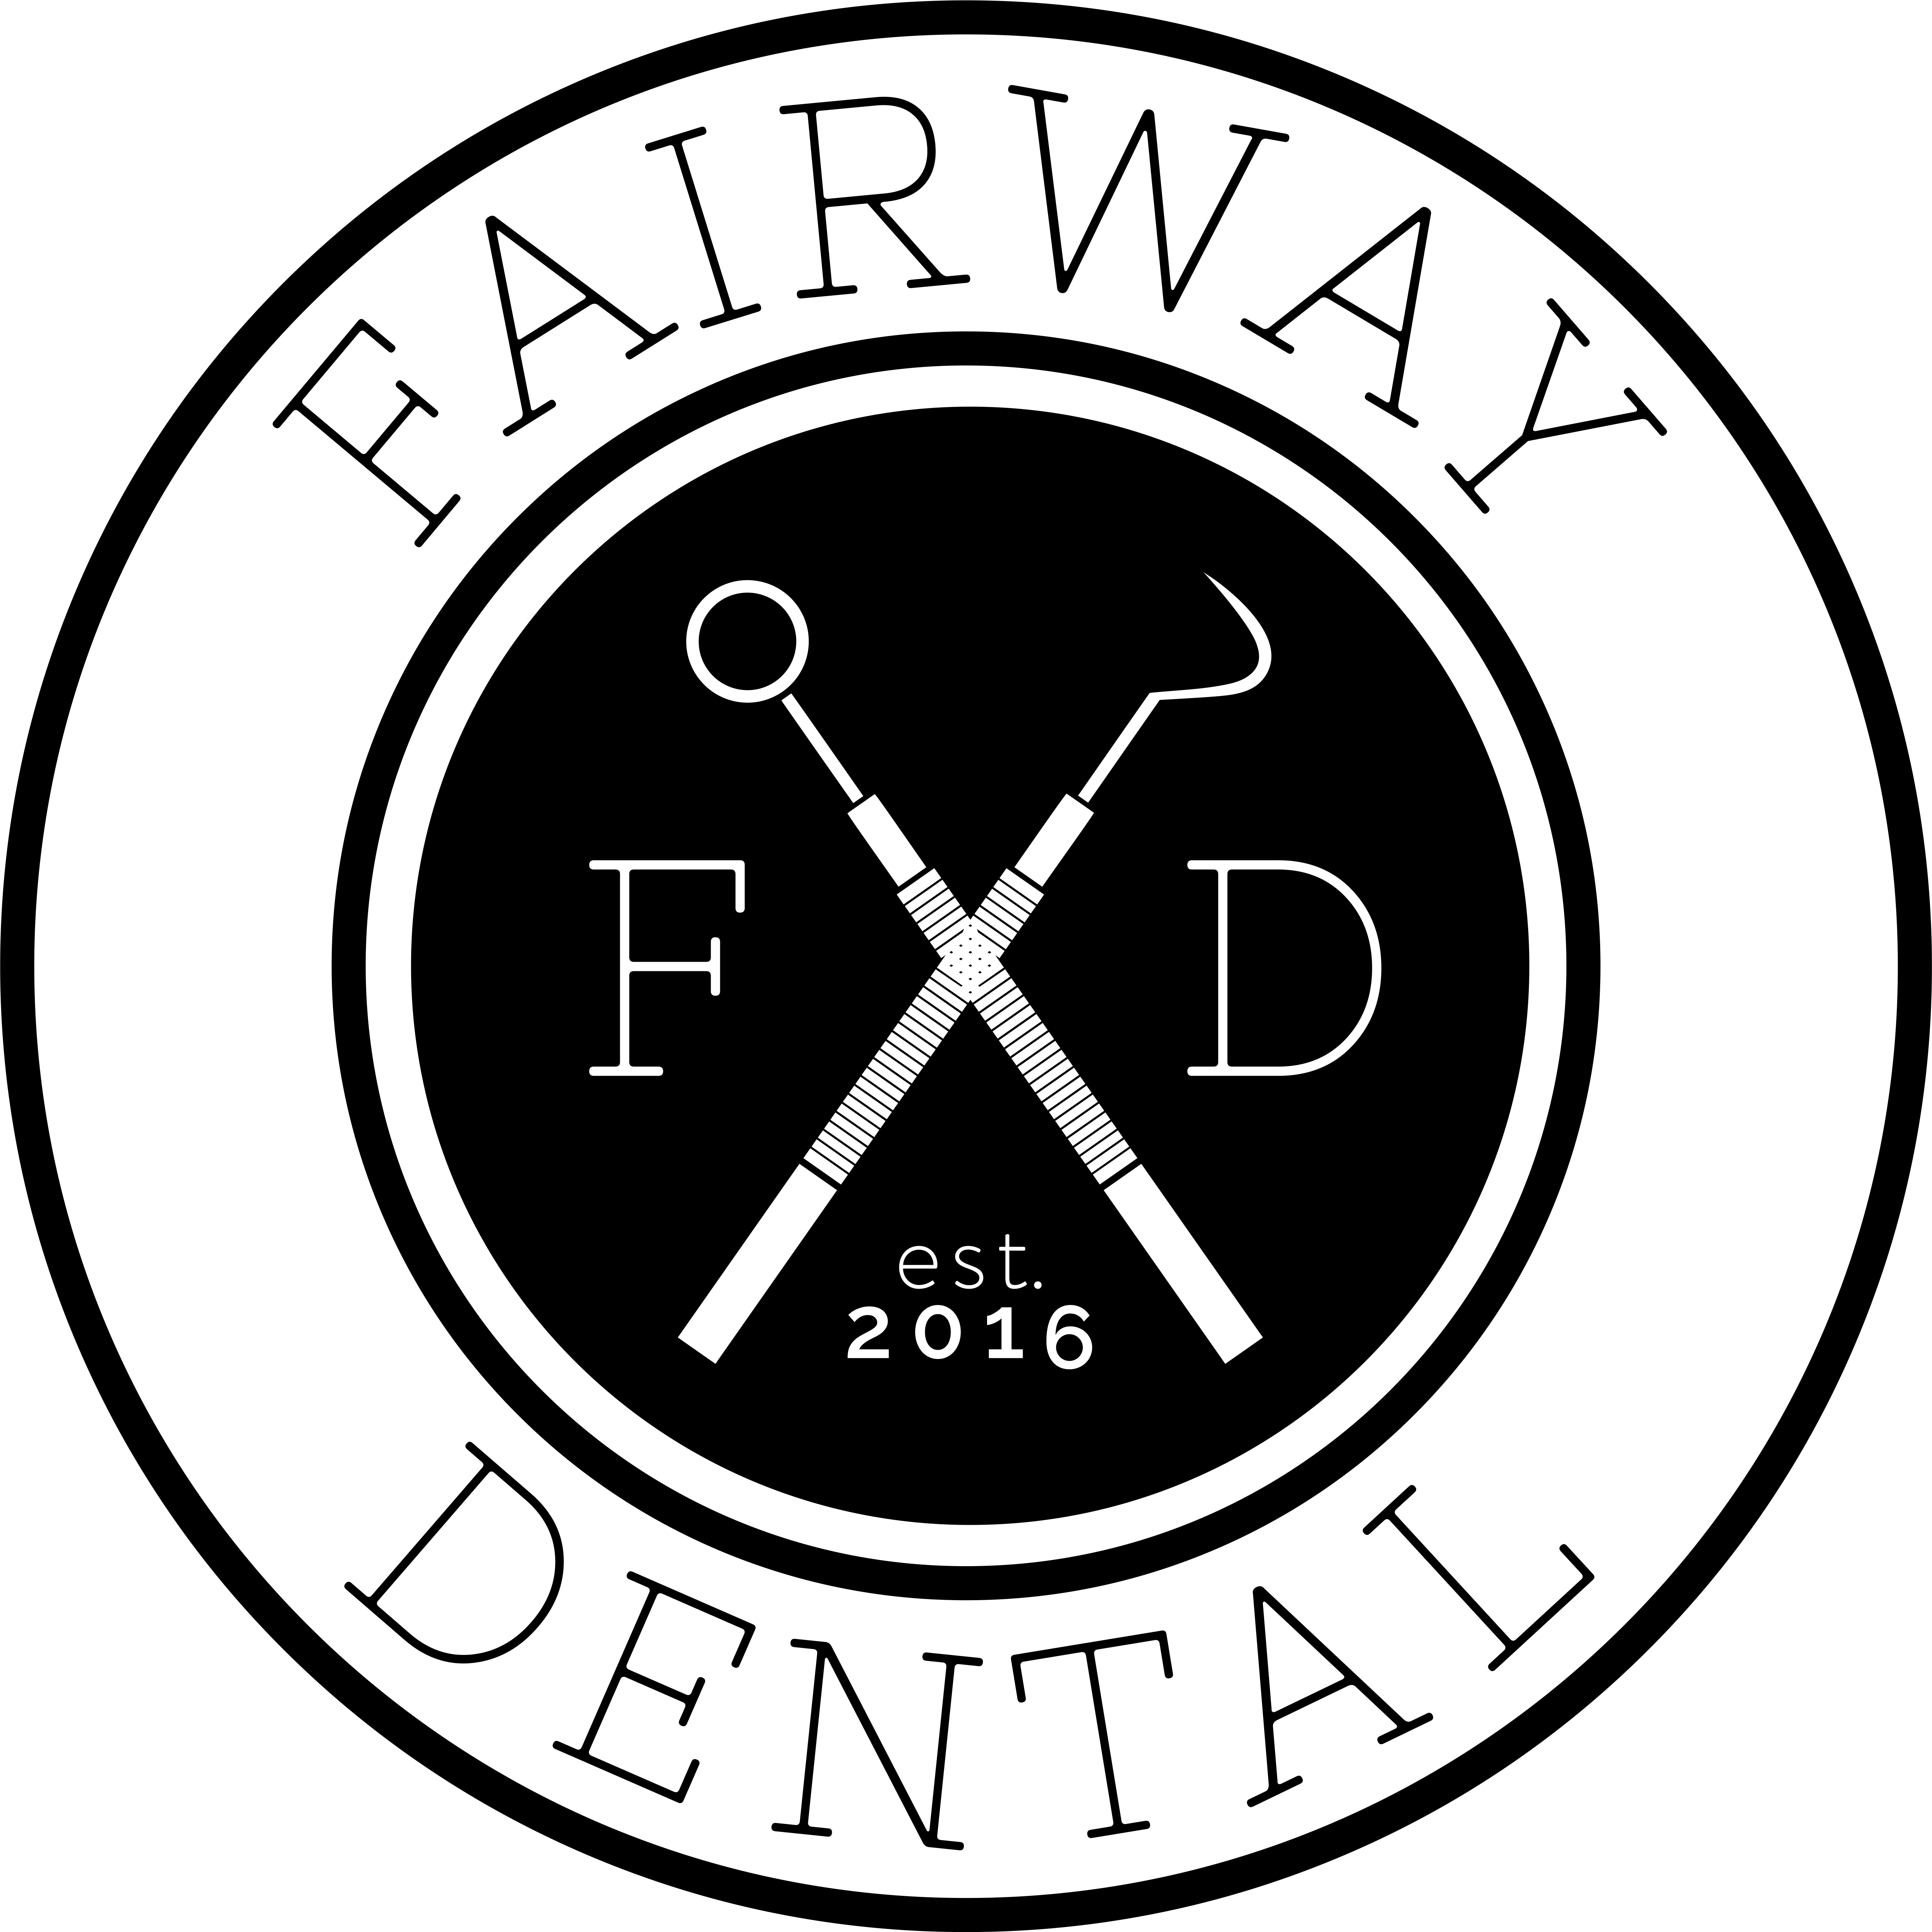 Fairway Dental